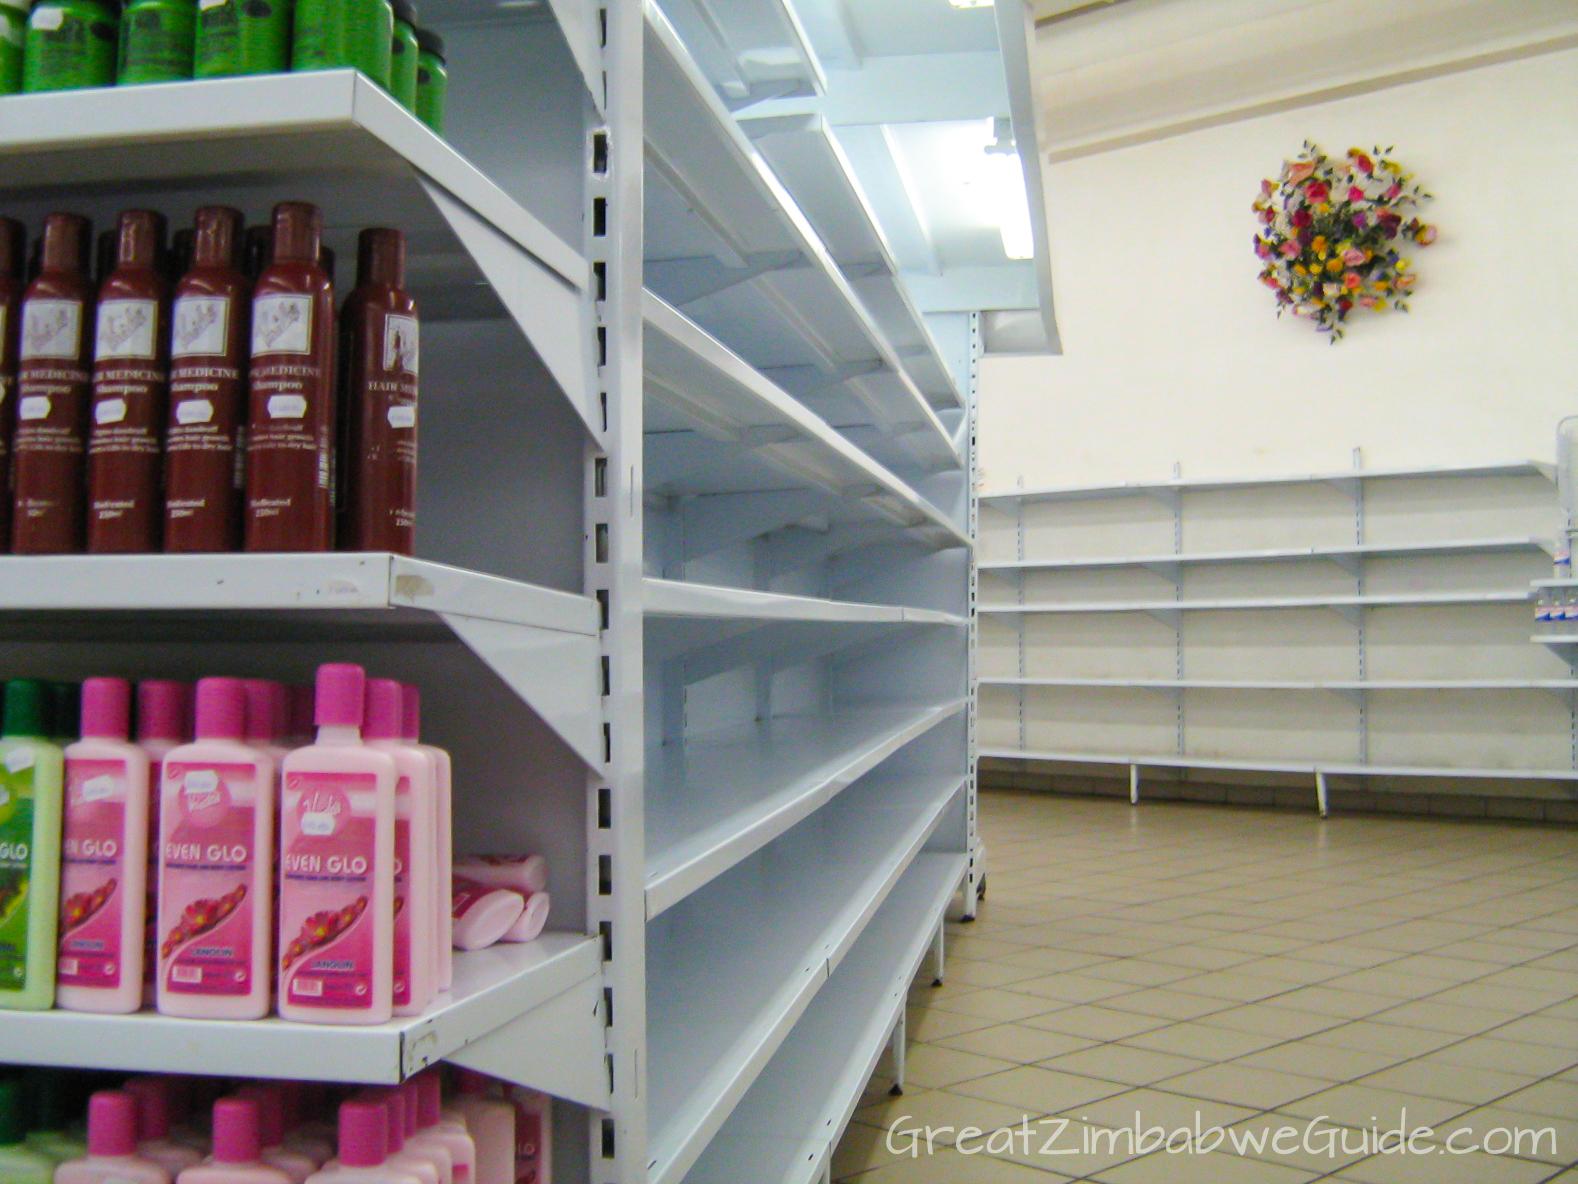 Great Zimbabwe Guide 2008 Supermarket Shelves Hyperinflation